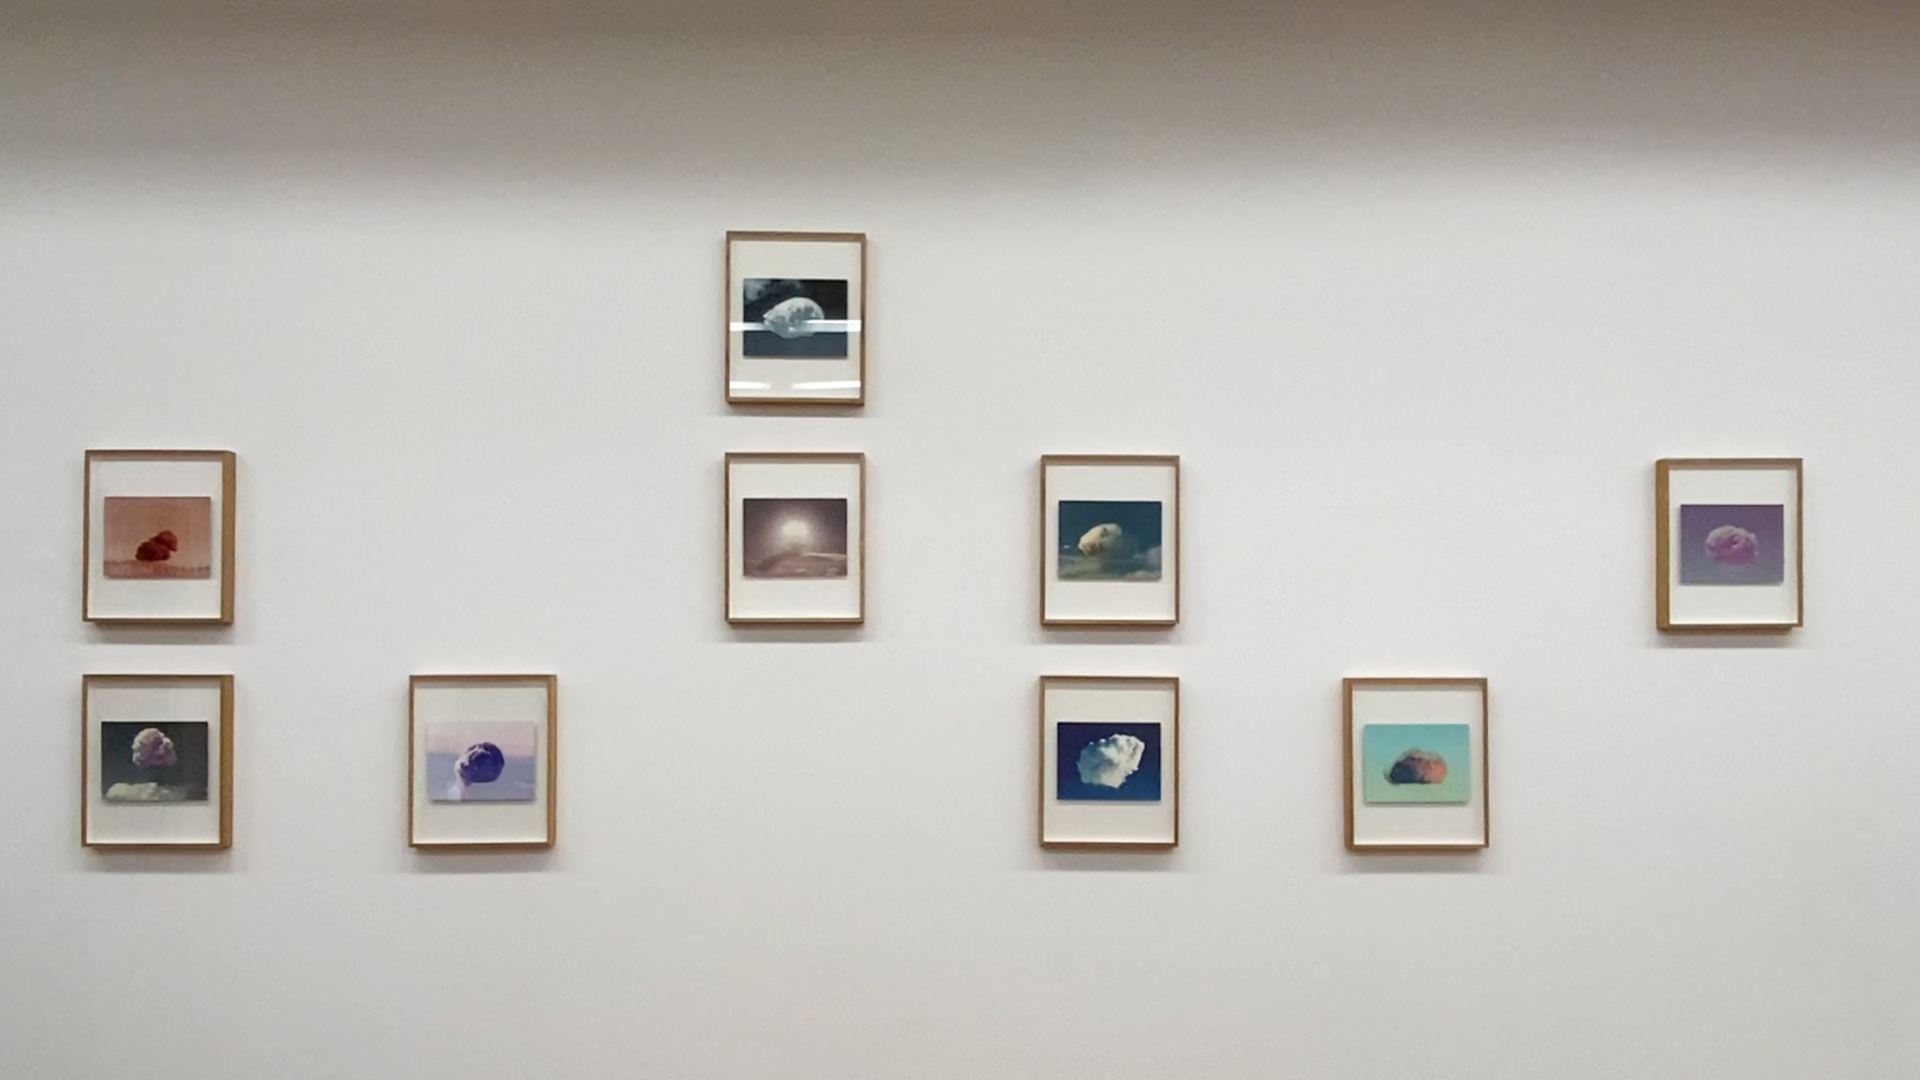 Alberto Sinigaglia, Microwave City: the Cloud Series (installation view)